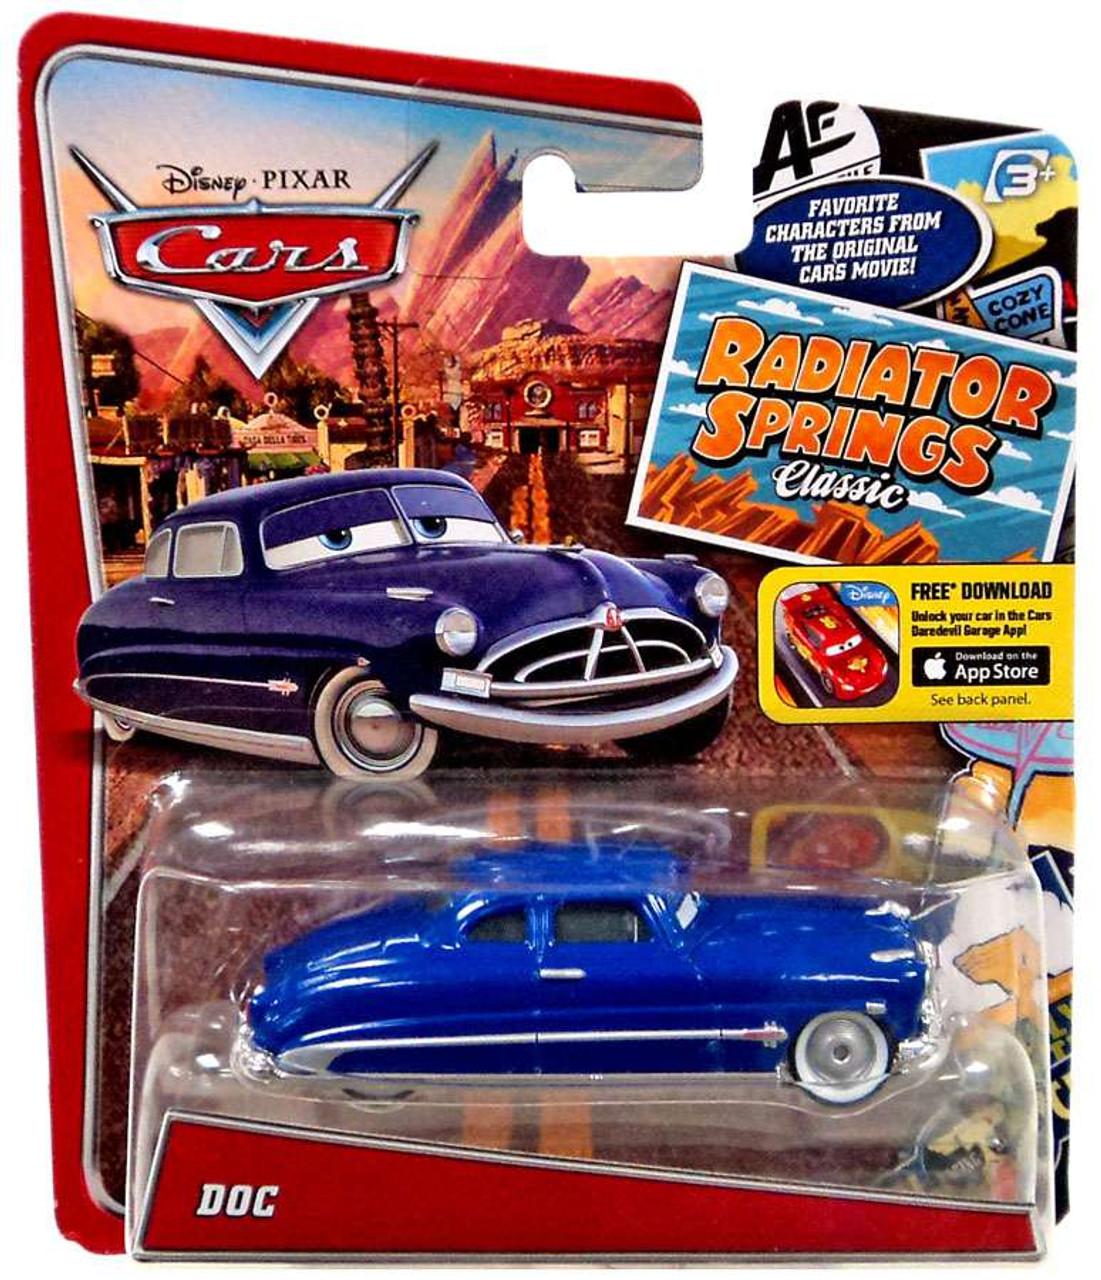 2019 Disney Pixar Cars Radiator Springs Doc Hudson Diecast Car